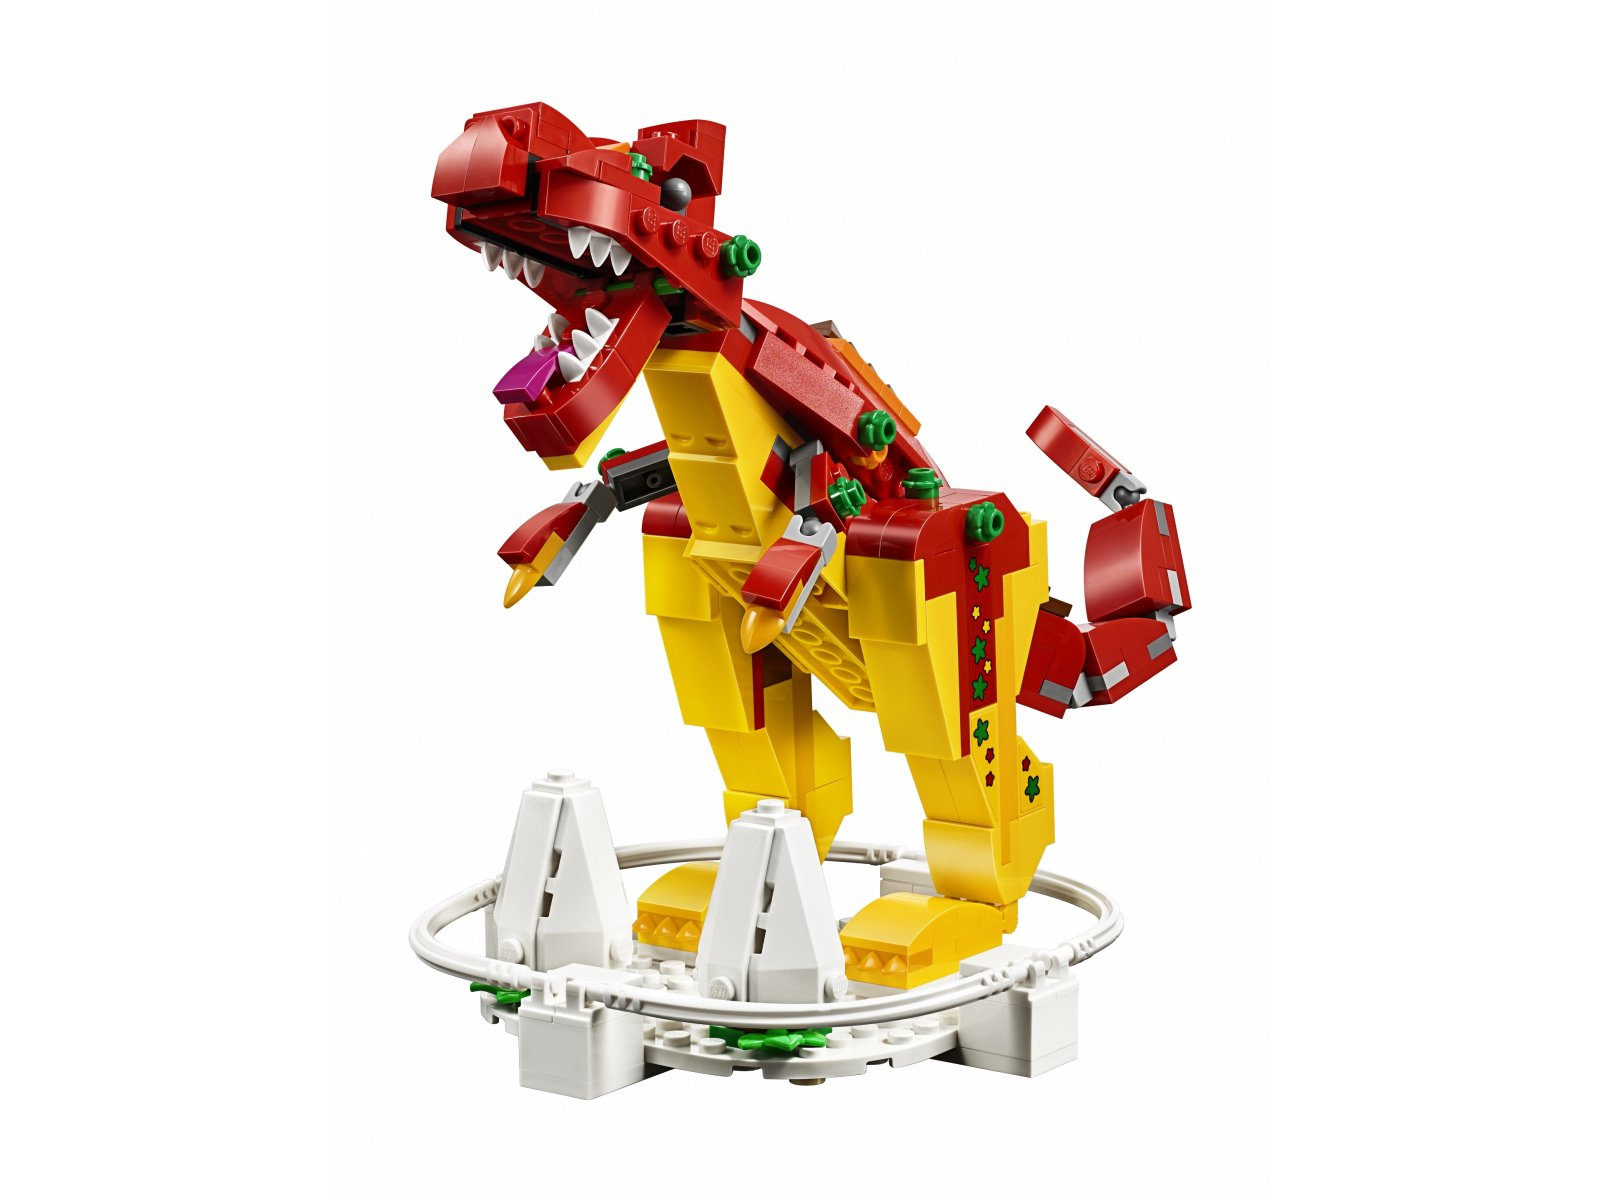 LEGO House Dinosaurs 40366